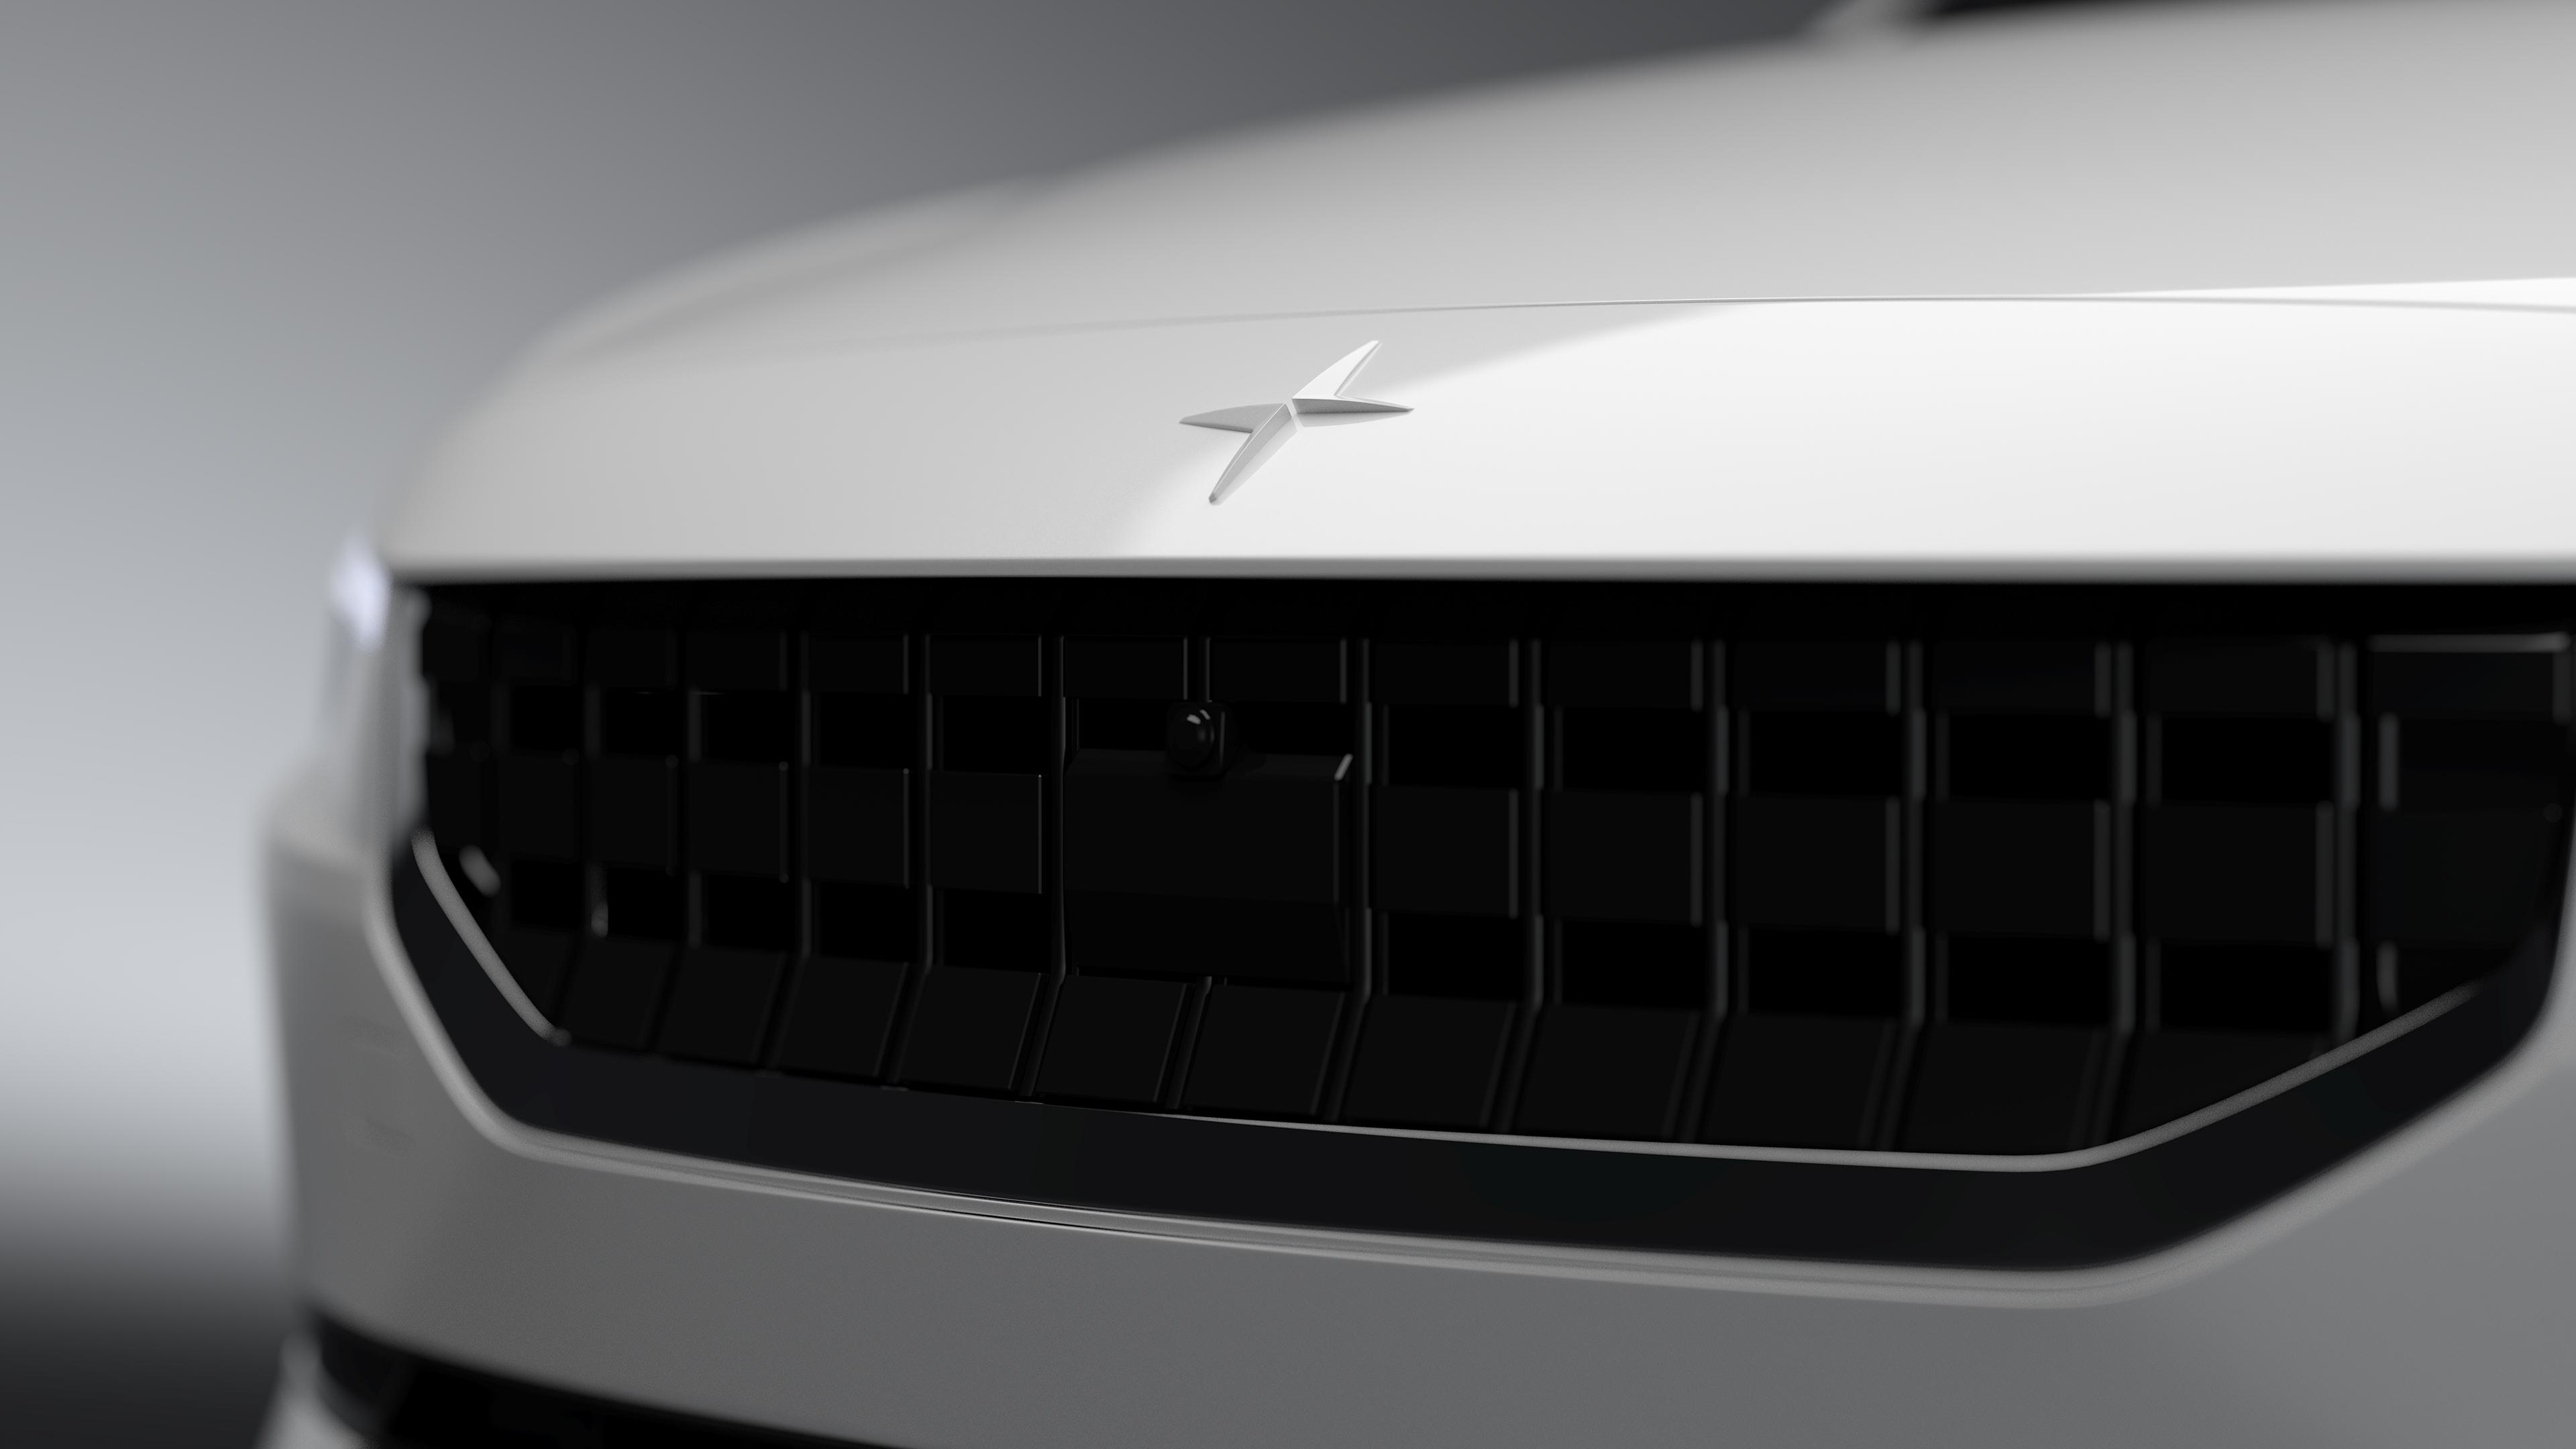 General 3840x2160 Polestar Polestar 2 Volvo 3D visualization digital art Grille render car vehicle automotive vred CGI